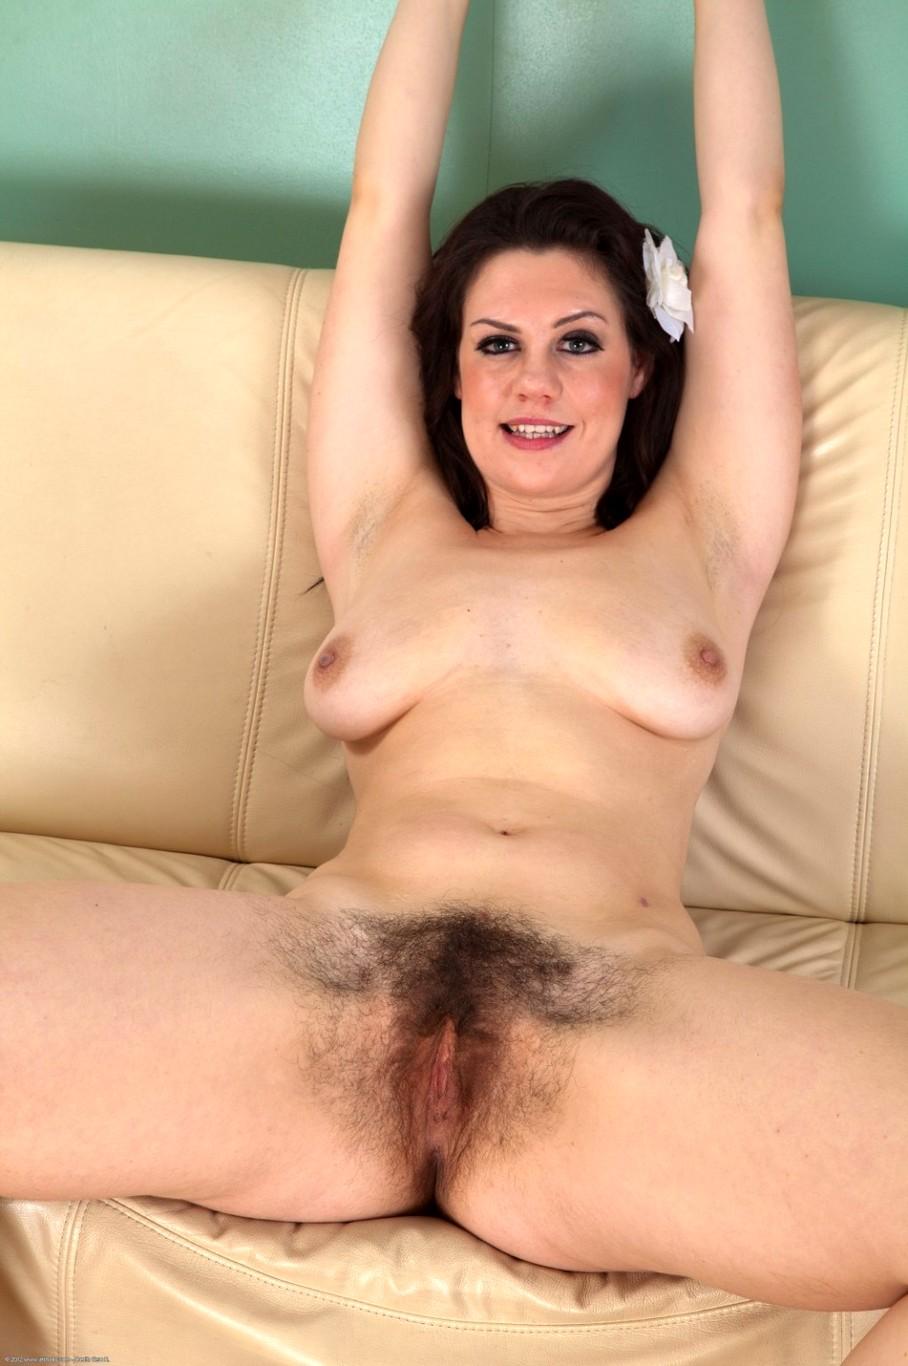 Babe Today Nude And Hairy Melissa Ok Atk Hairy Xxx -3958